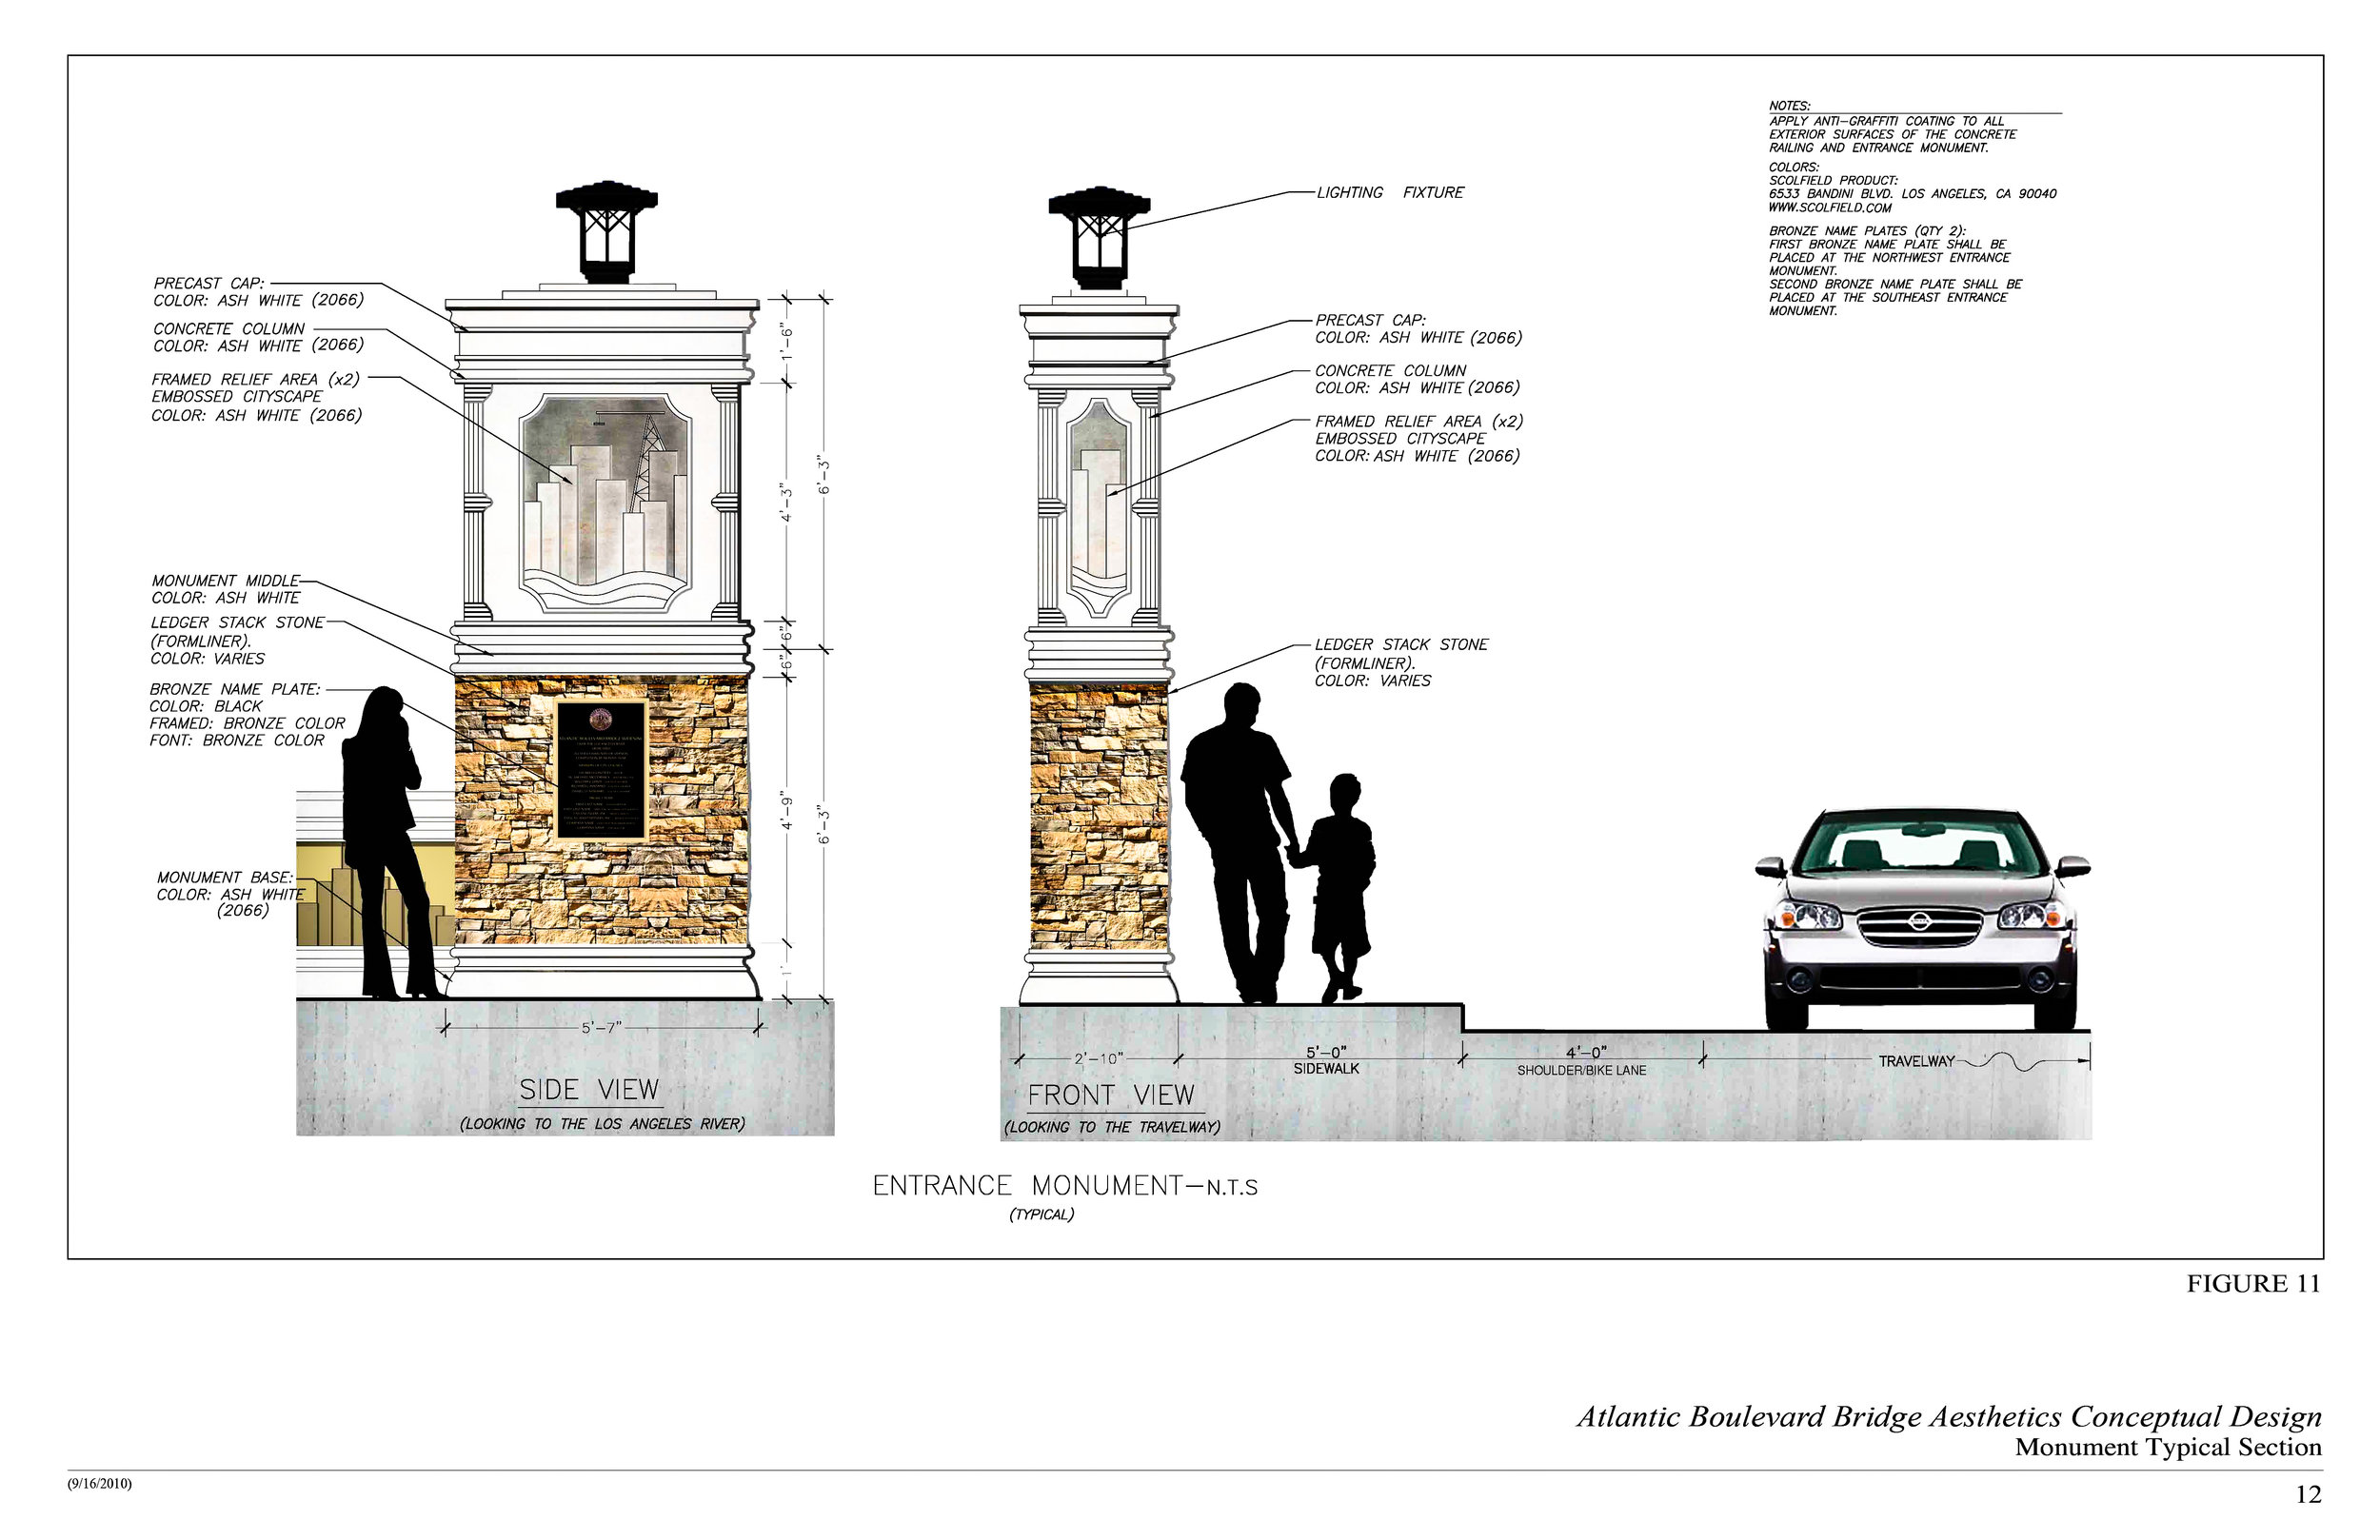 Atlantic Blvd Bridge_Entry Monument Typical Section.jpg